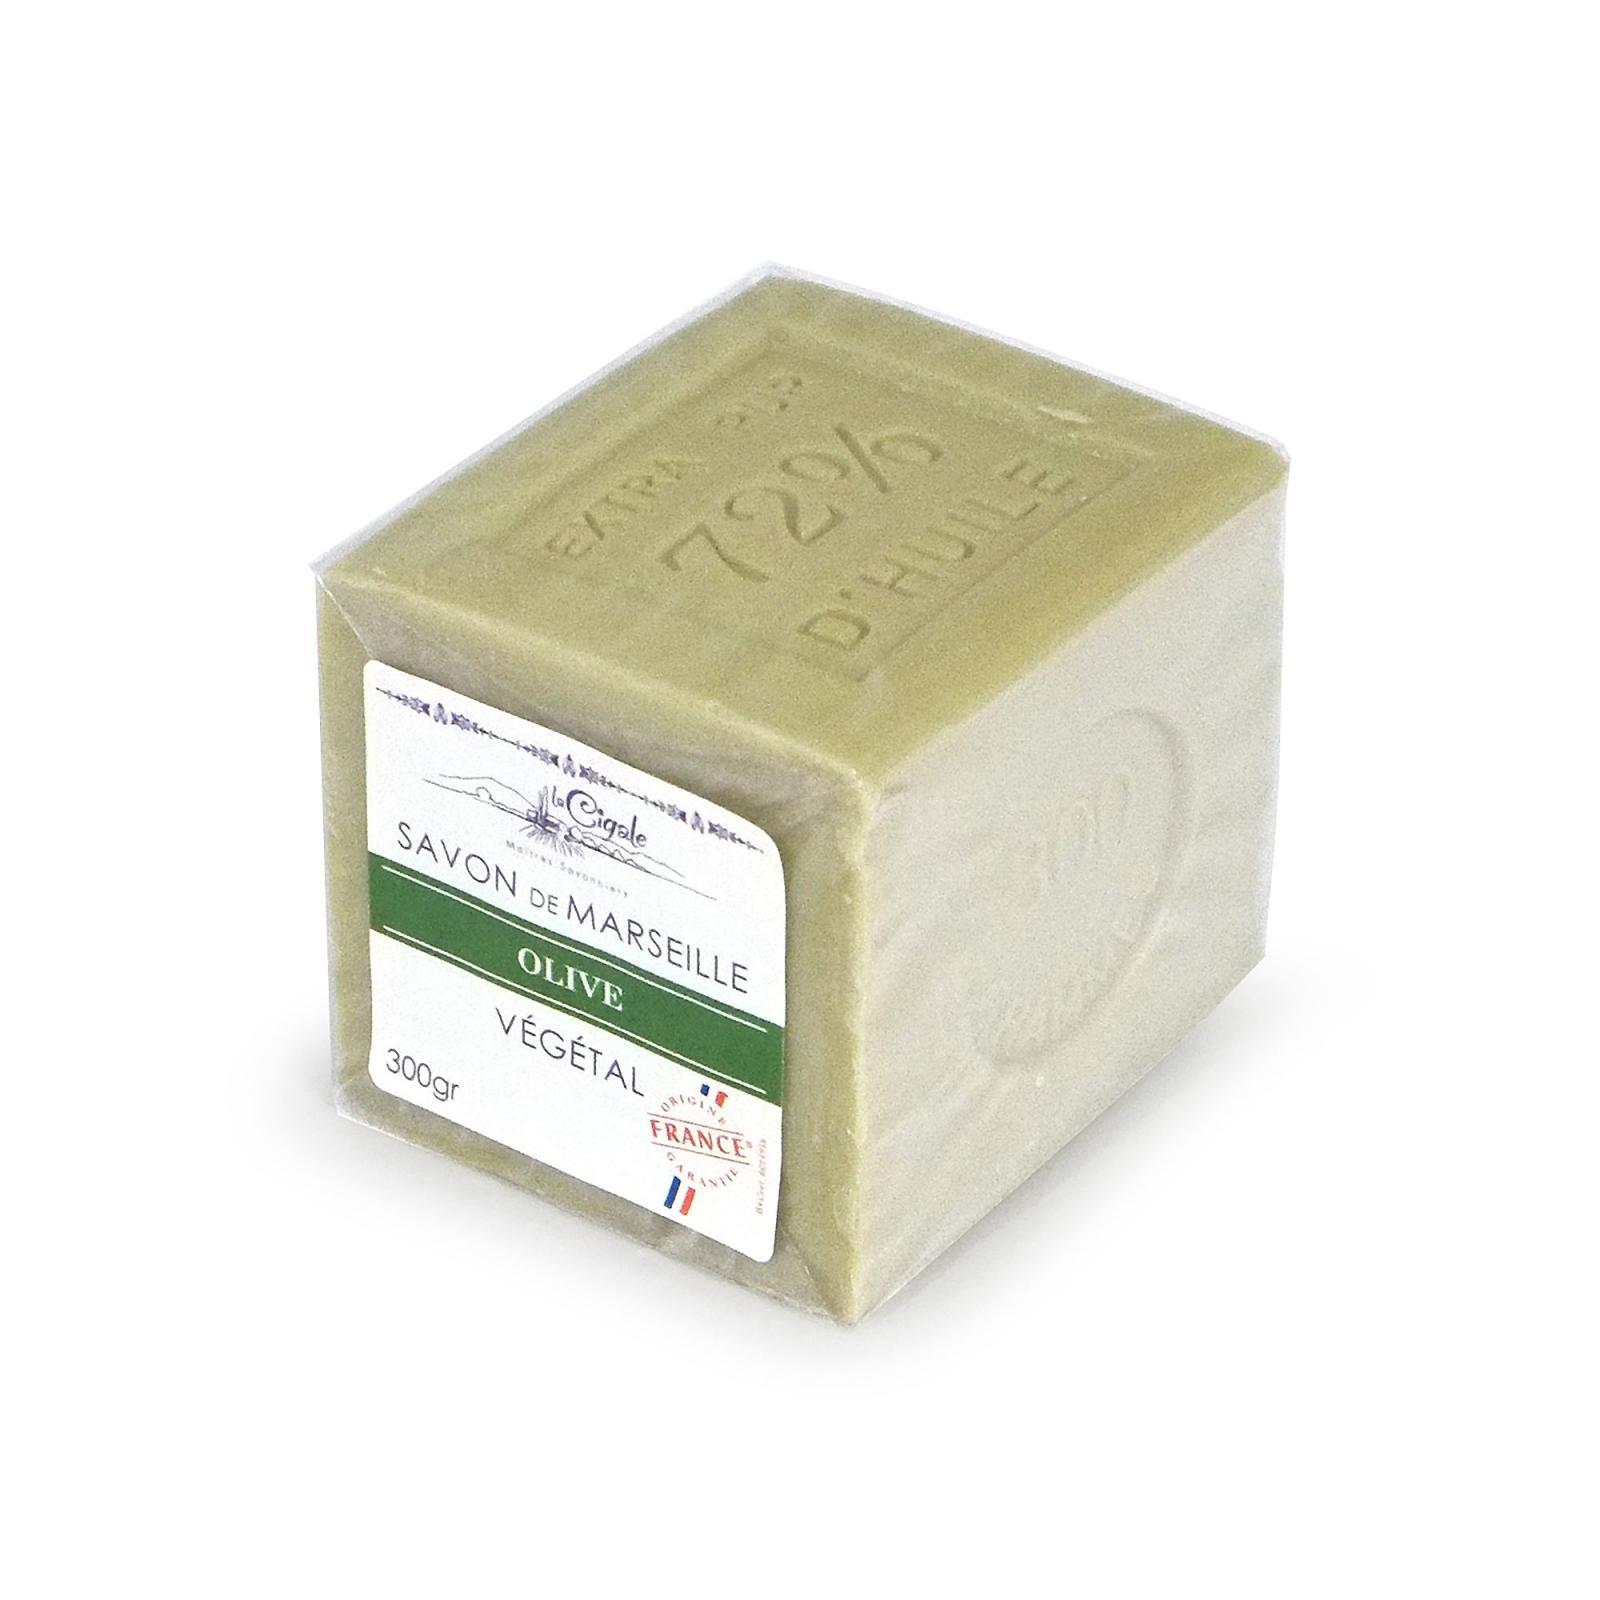 Cigale BIO Marseillské mýdlo, oliva 300 g